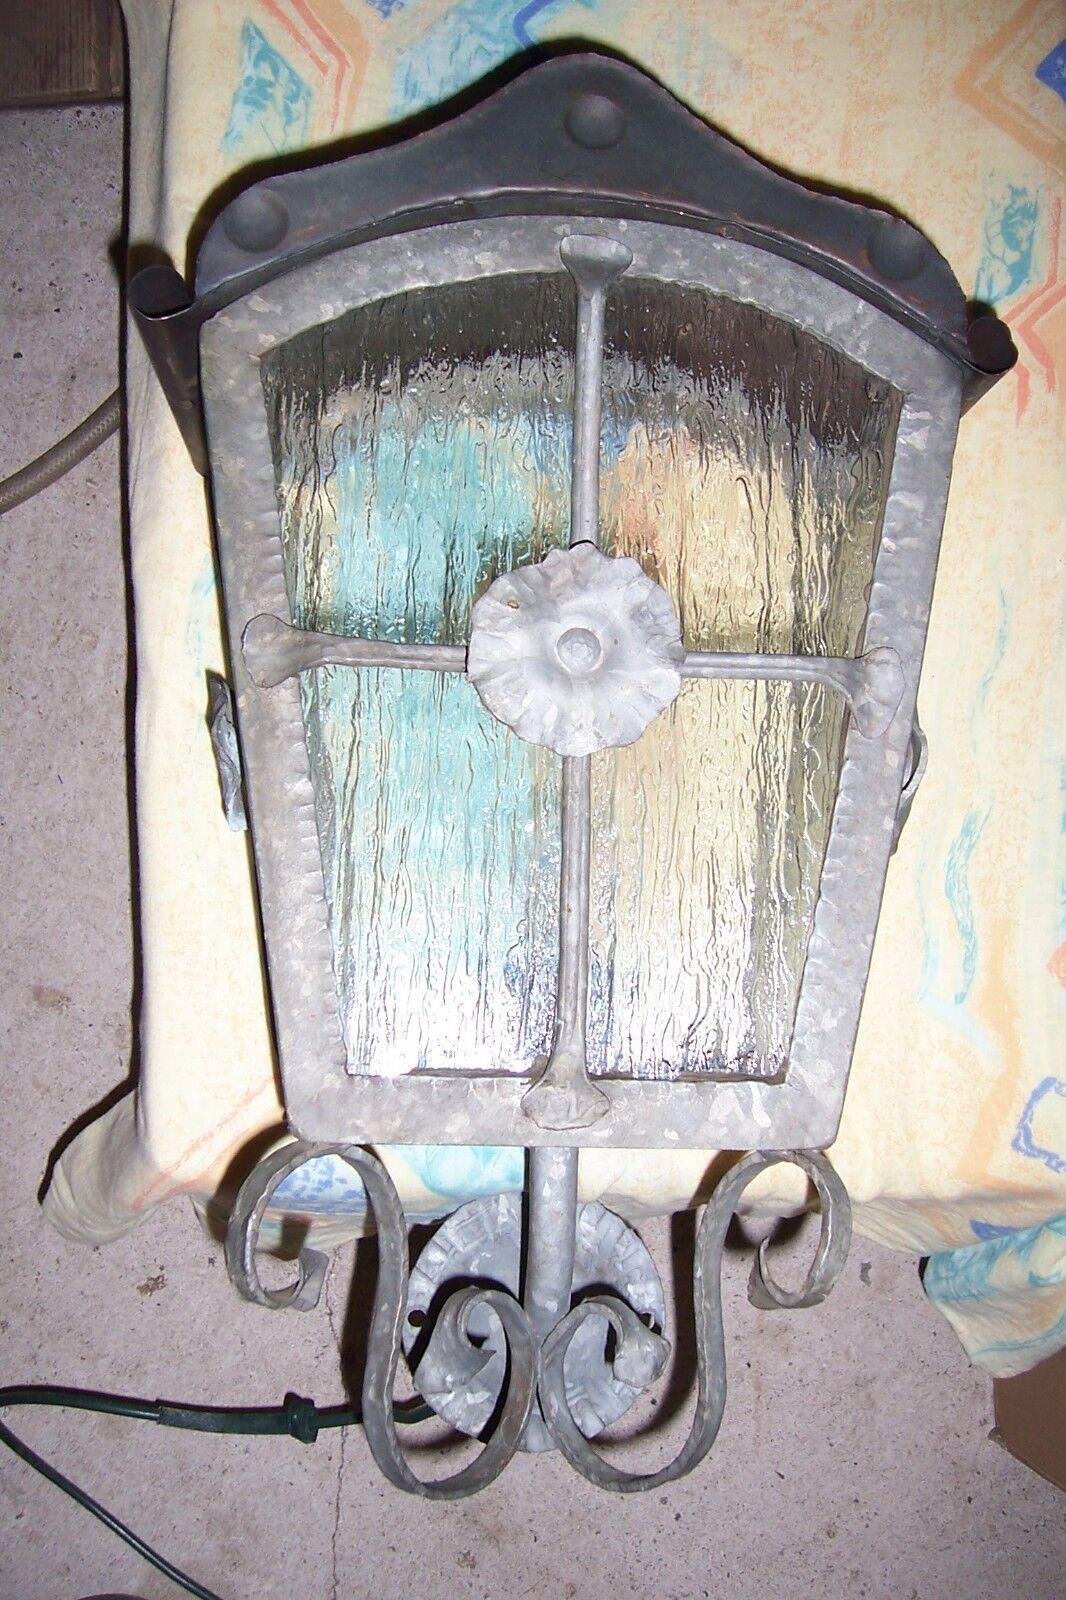 Wandlampe antik rustikal Schmiedekunst Hoflampe Terrassenlampe Leuchte außen